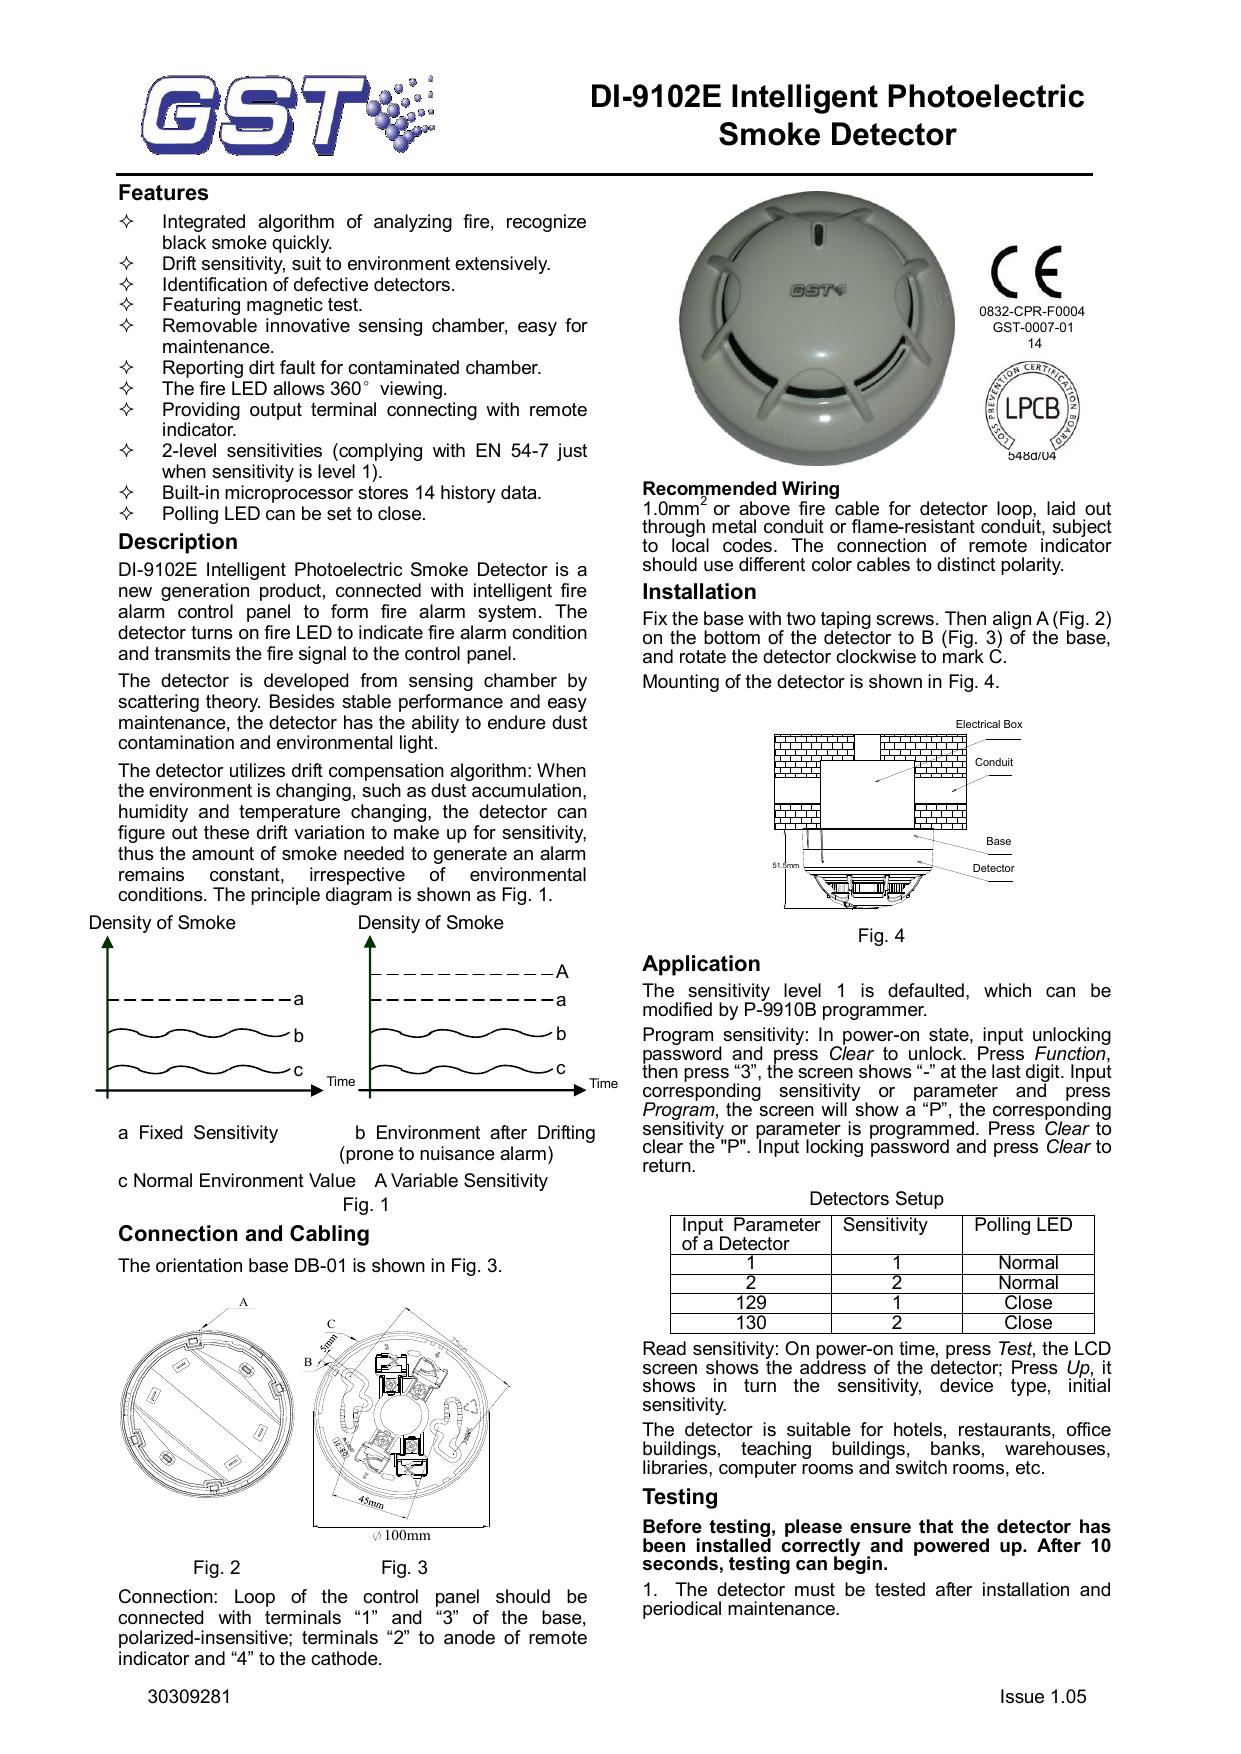 Di 9102e Intelligent Photoelectric Smoke Detector Manualzz